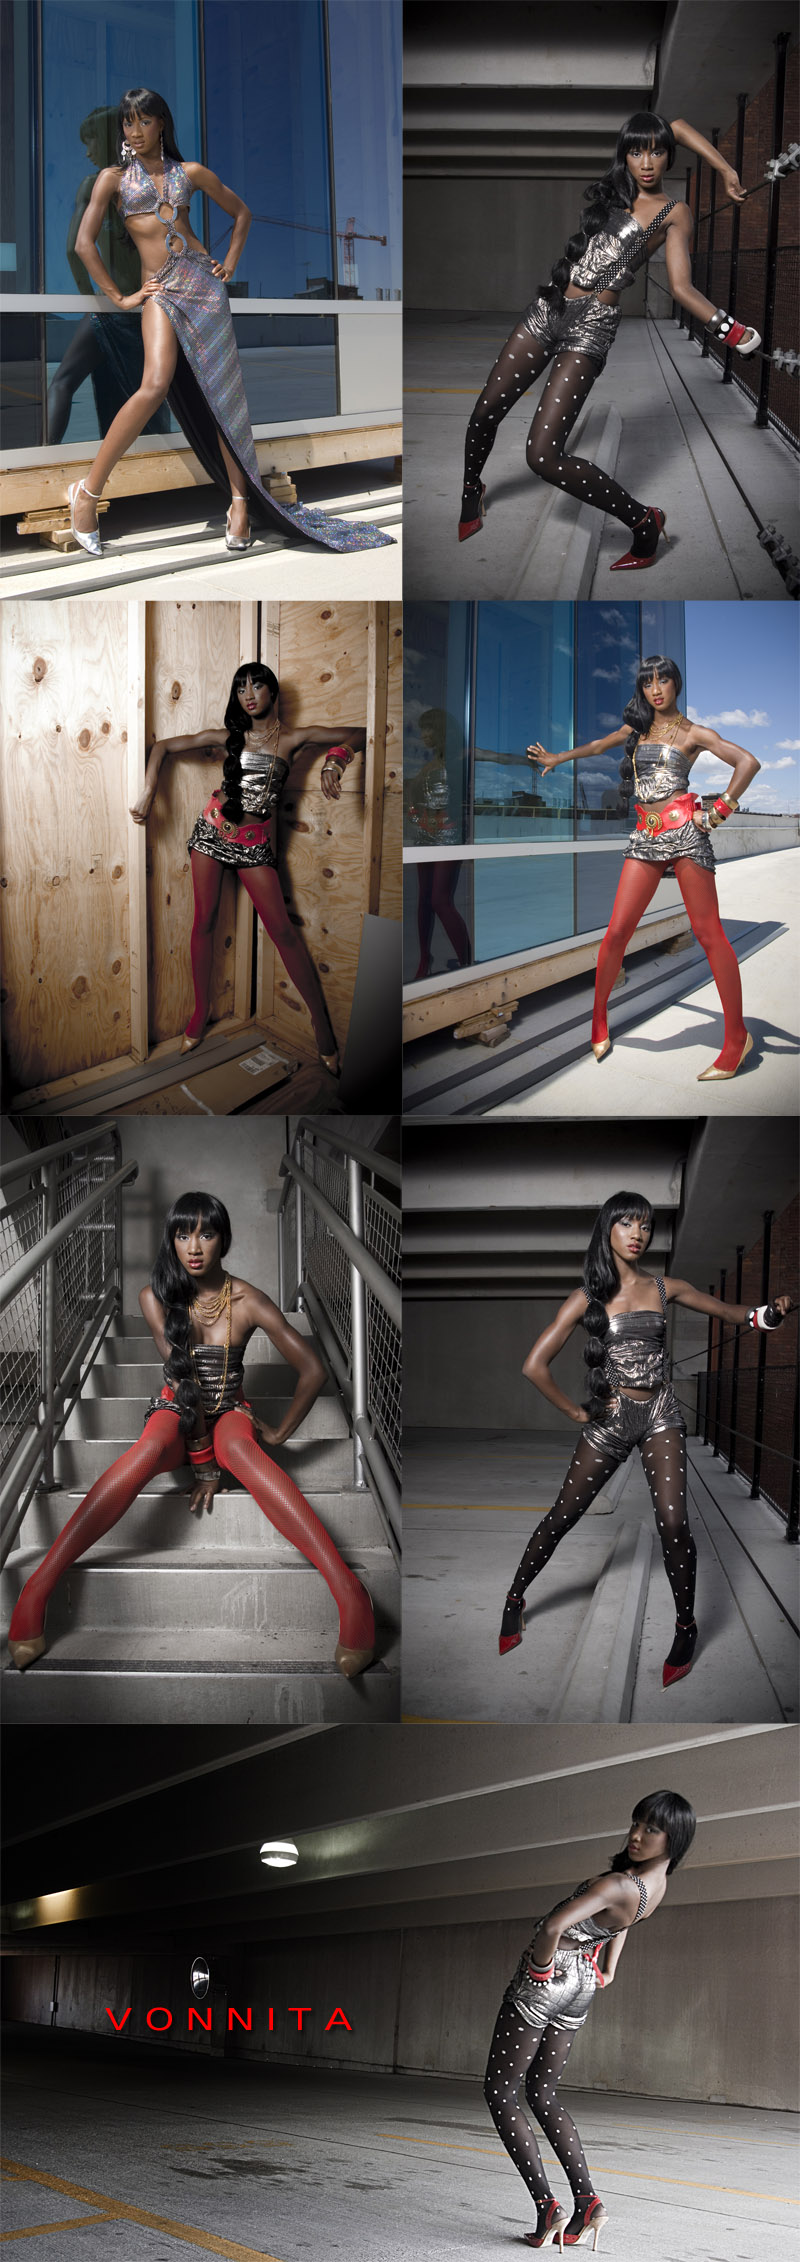 Female model photo shoot of Vonnita  by donnatella macKenzie, clothing designed by Nia Blu